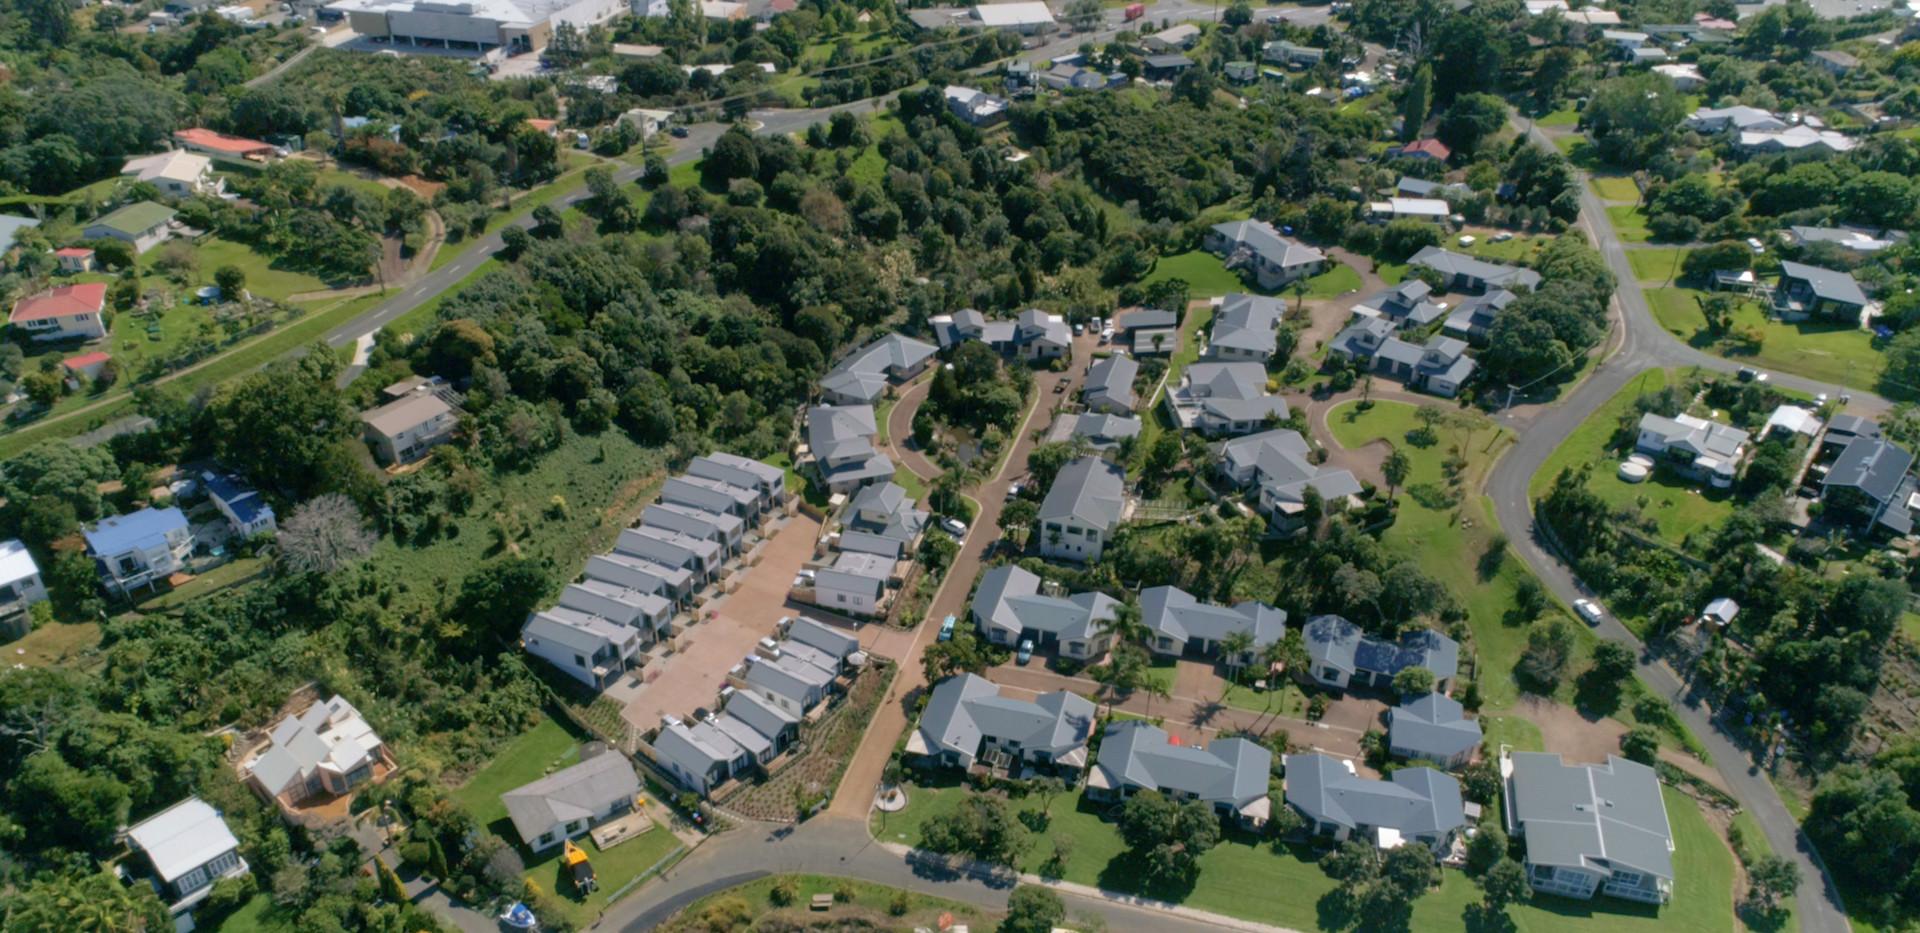 Aerial View Over Waiheke Retirement Village